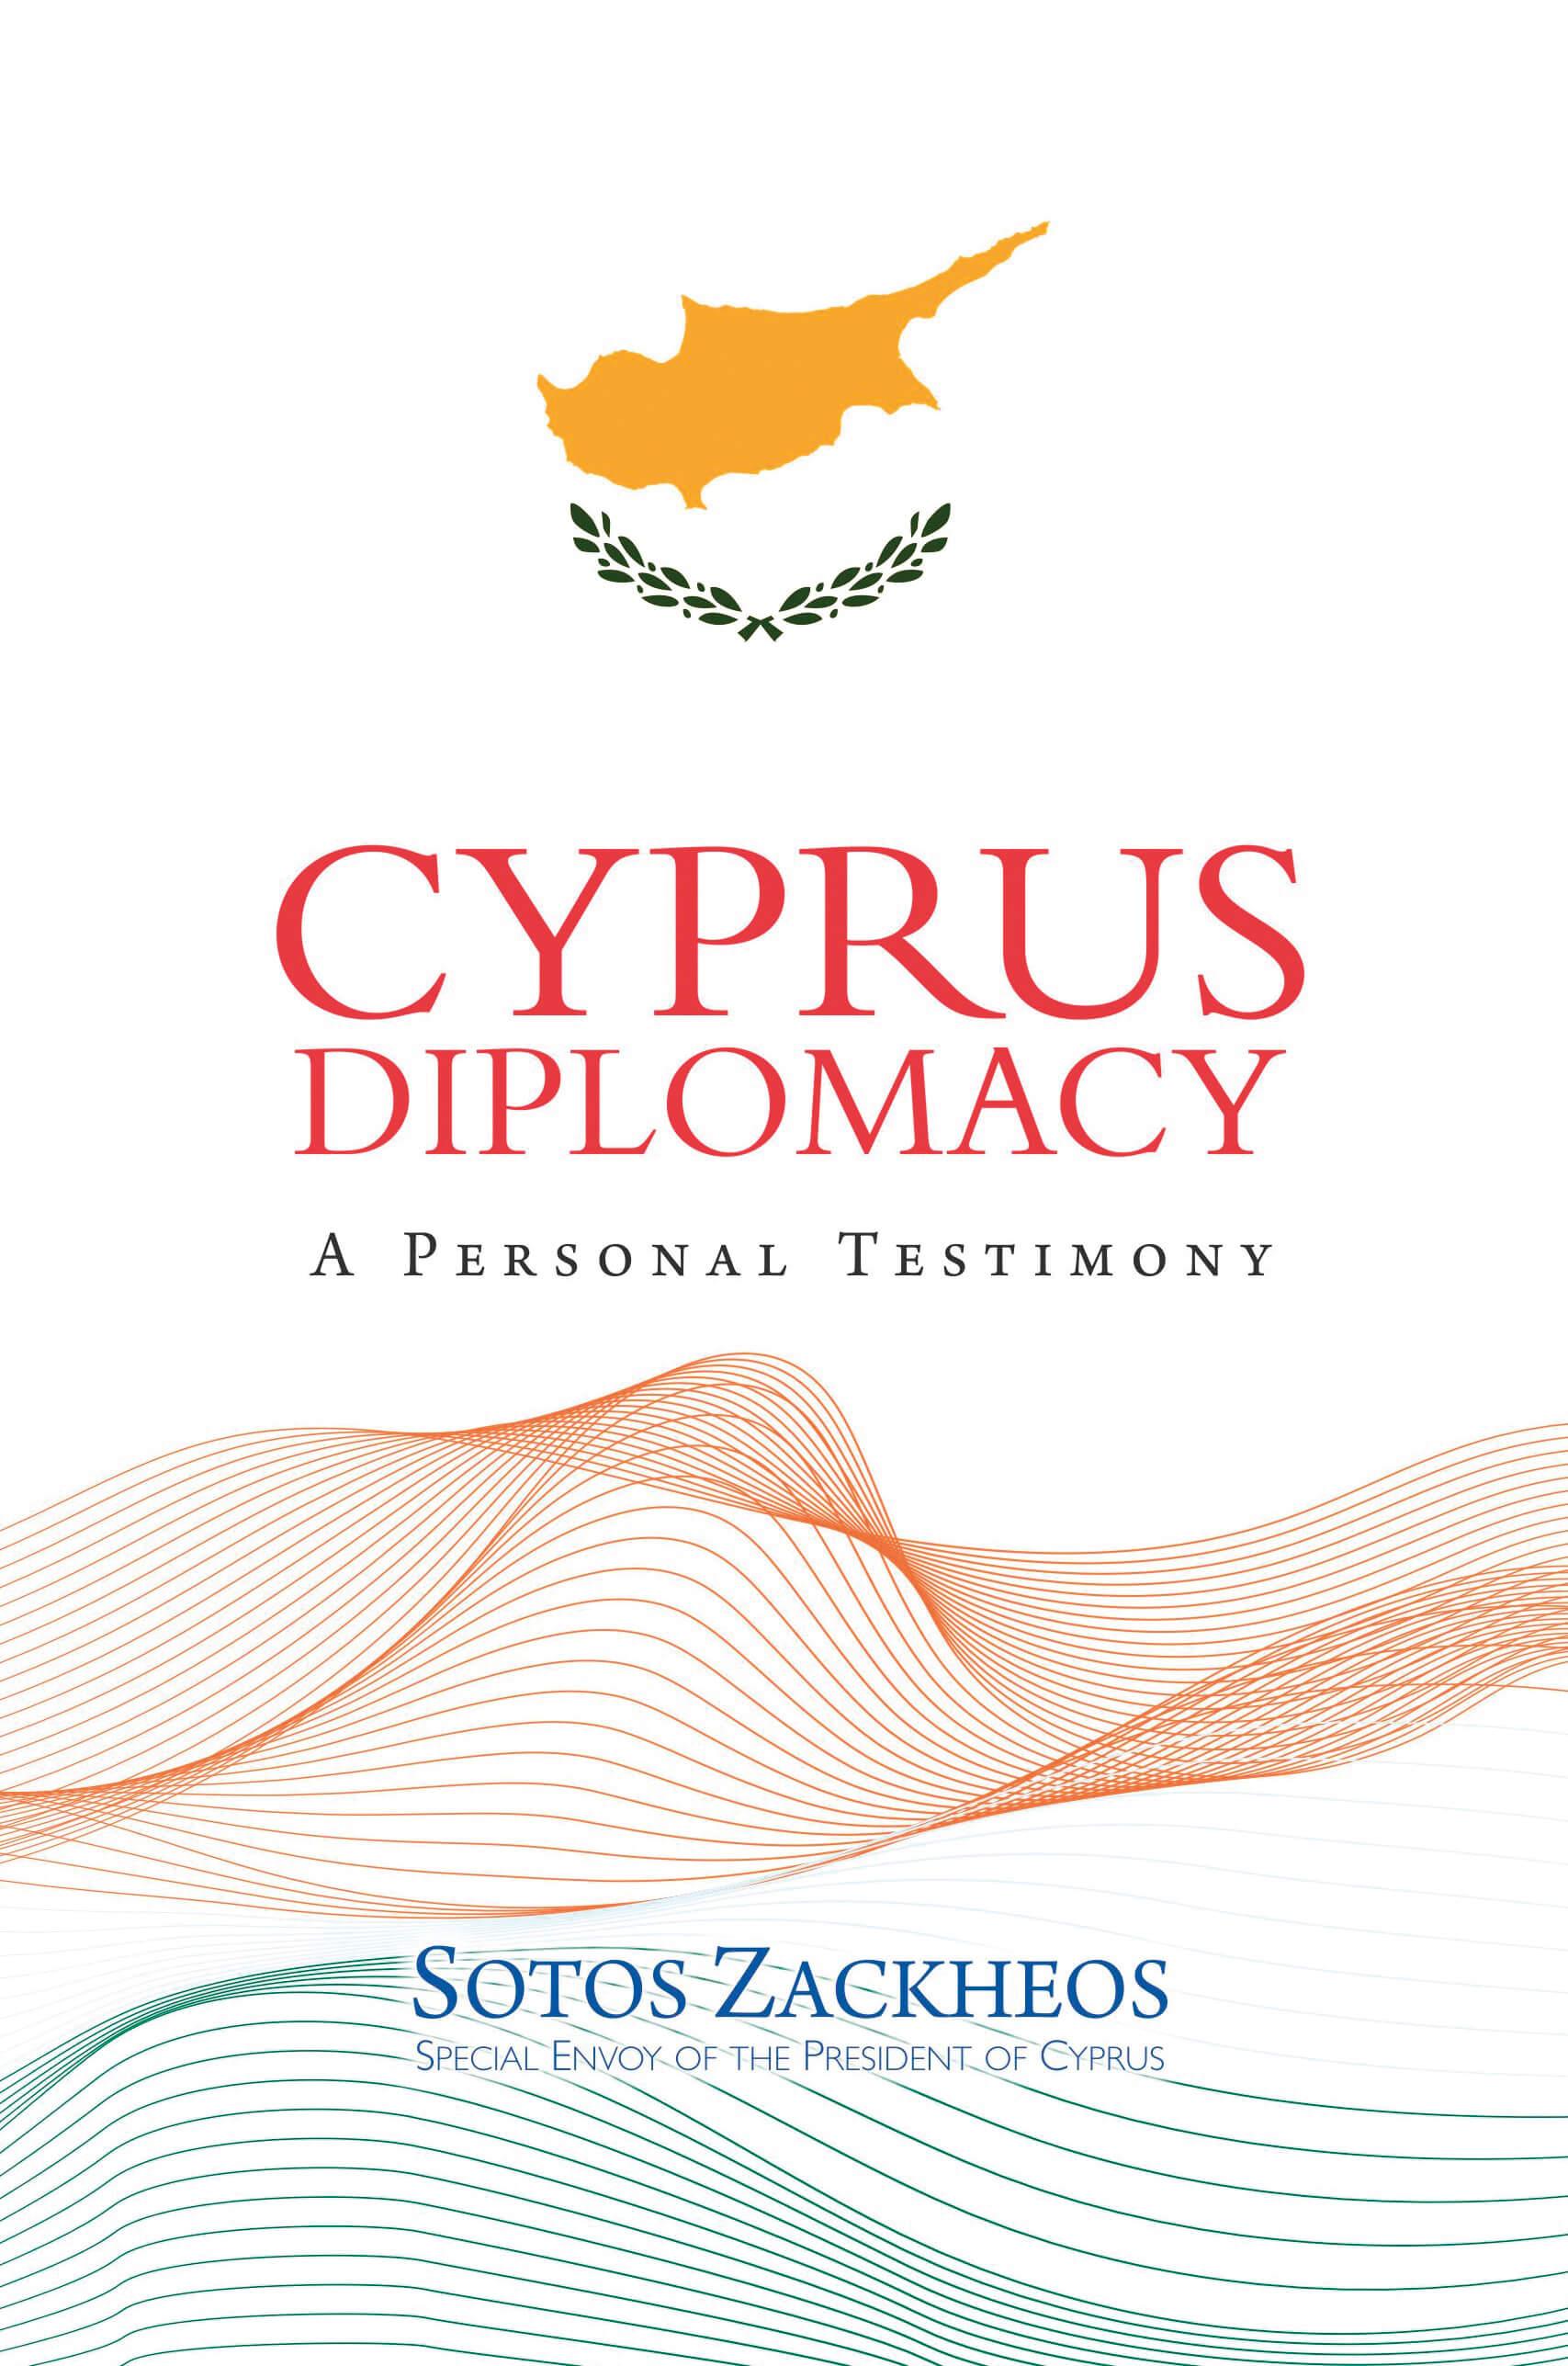 Cyprus Diplomacy